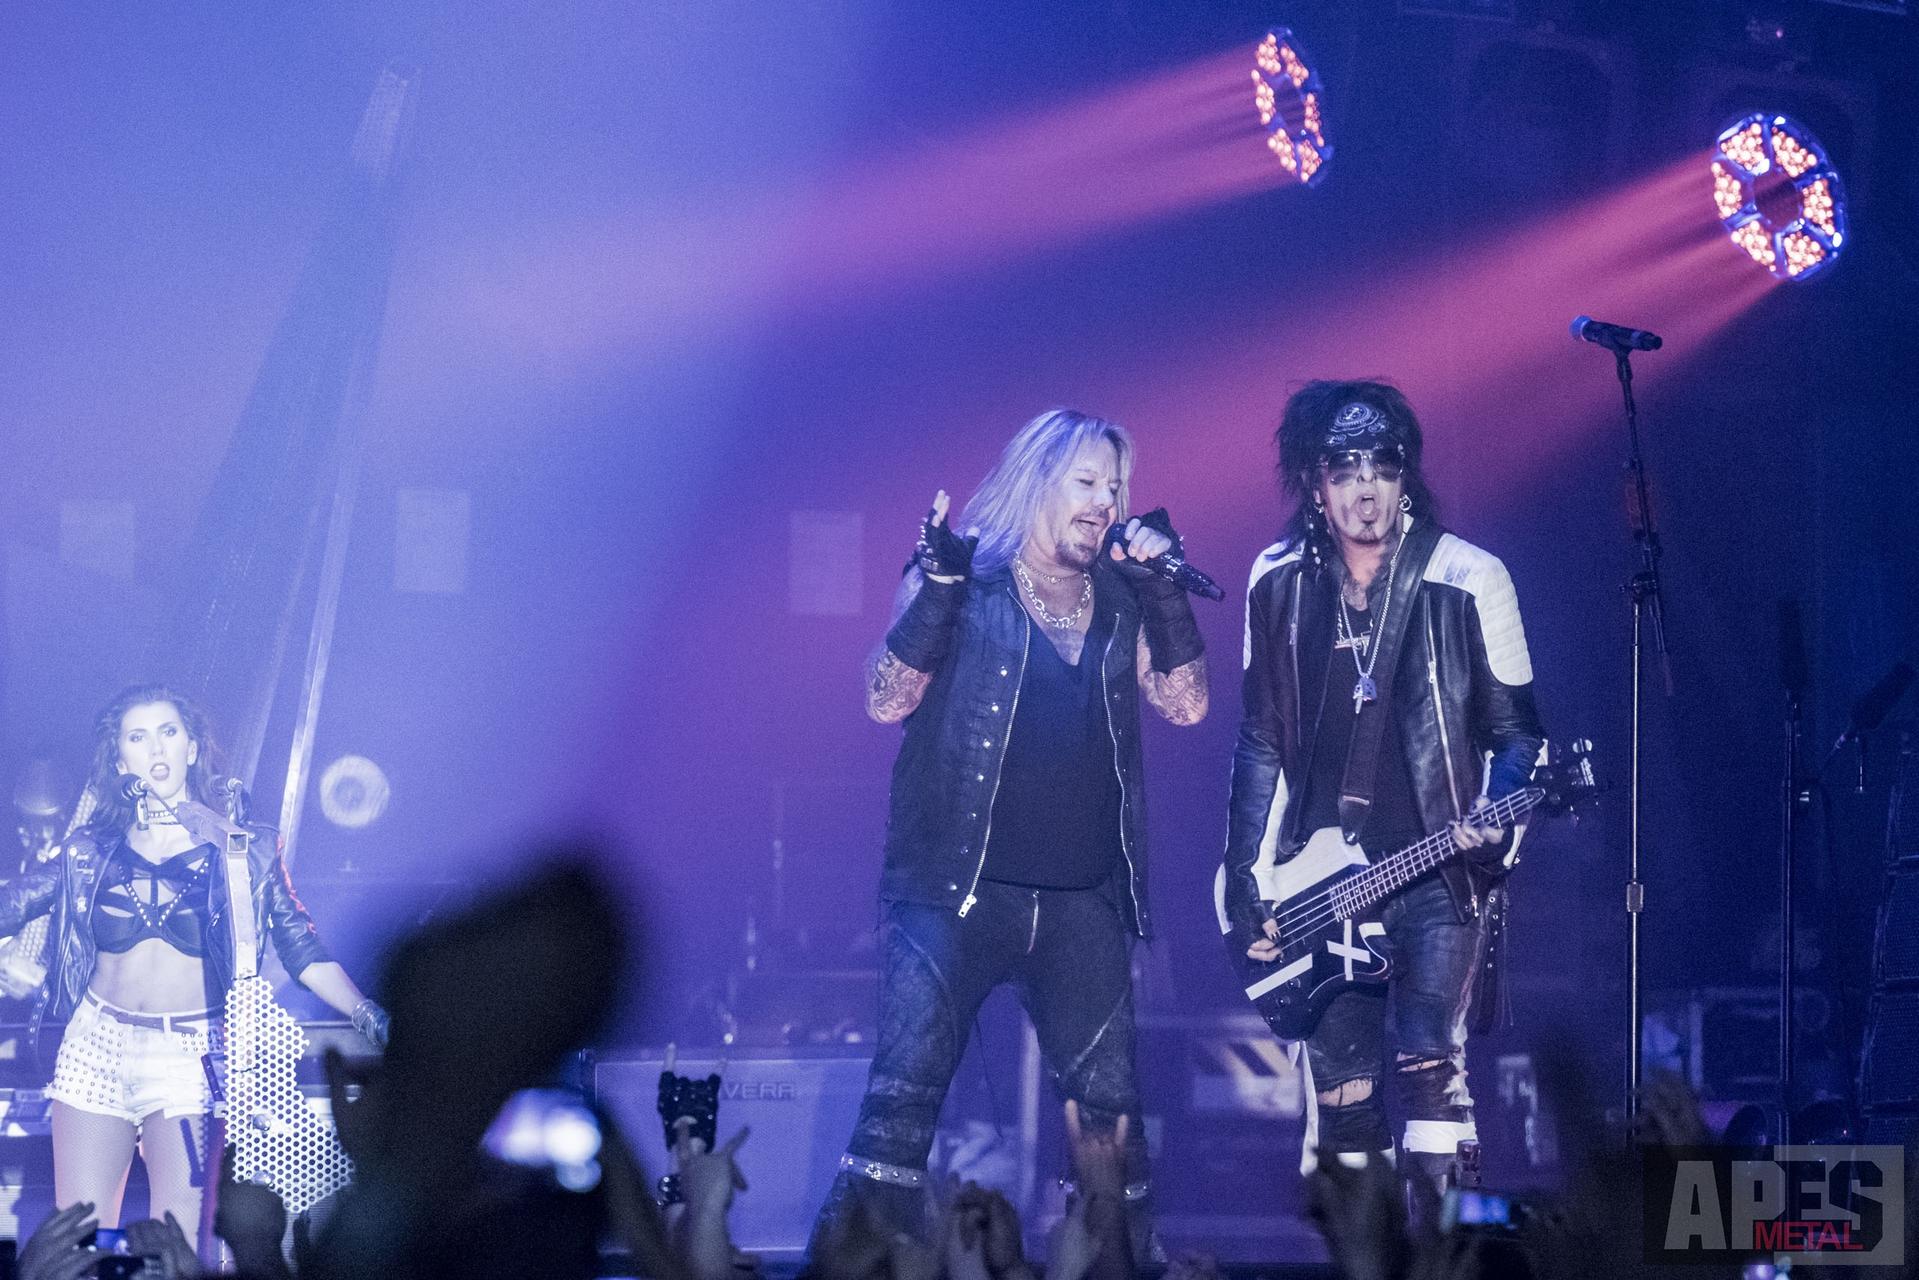 Mötley Crüe - The Final Tour 2015 in München - APES METAL